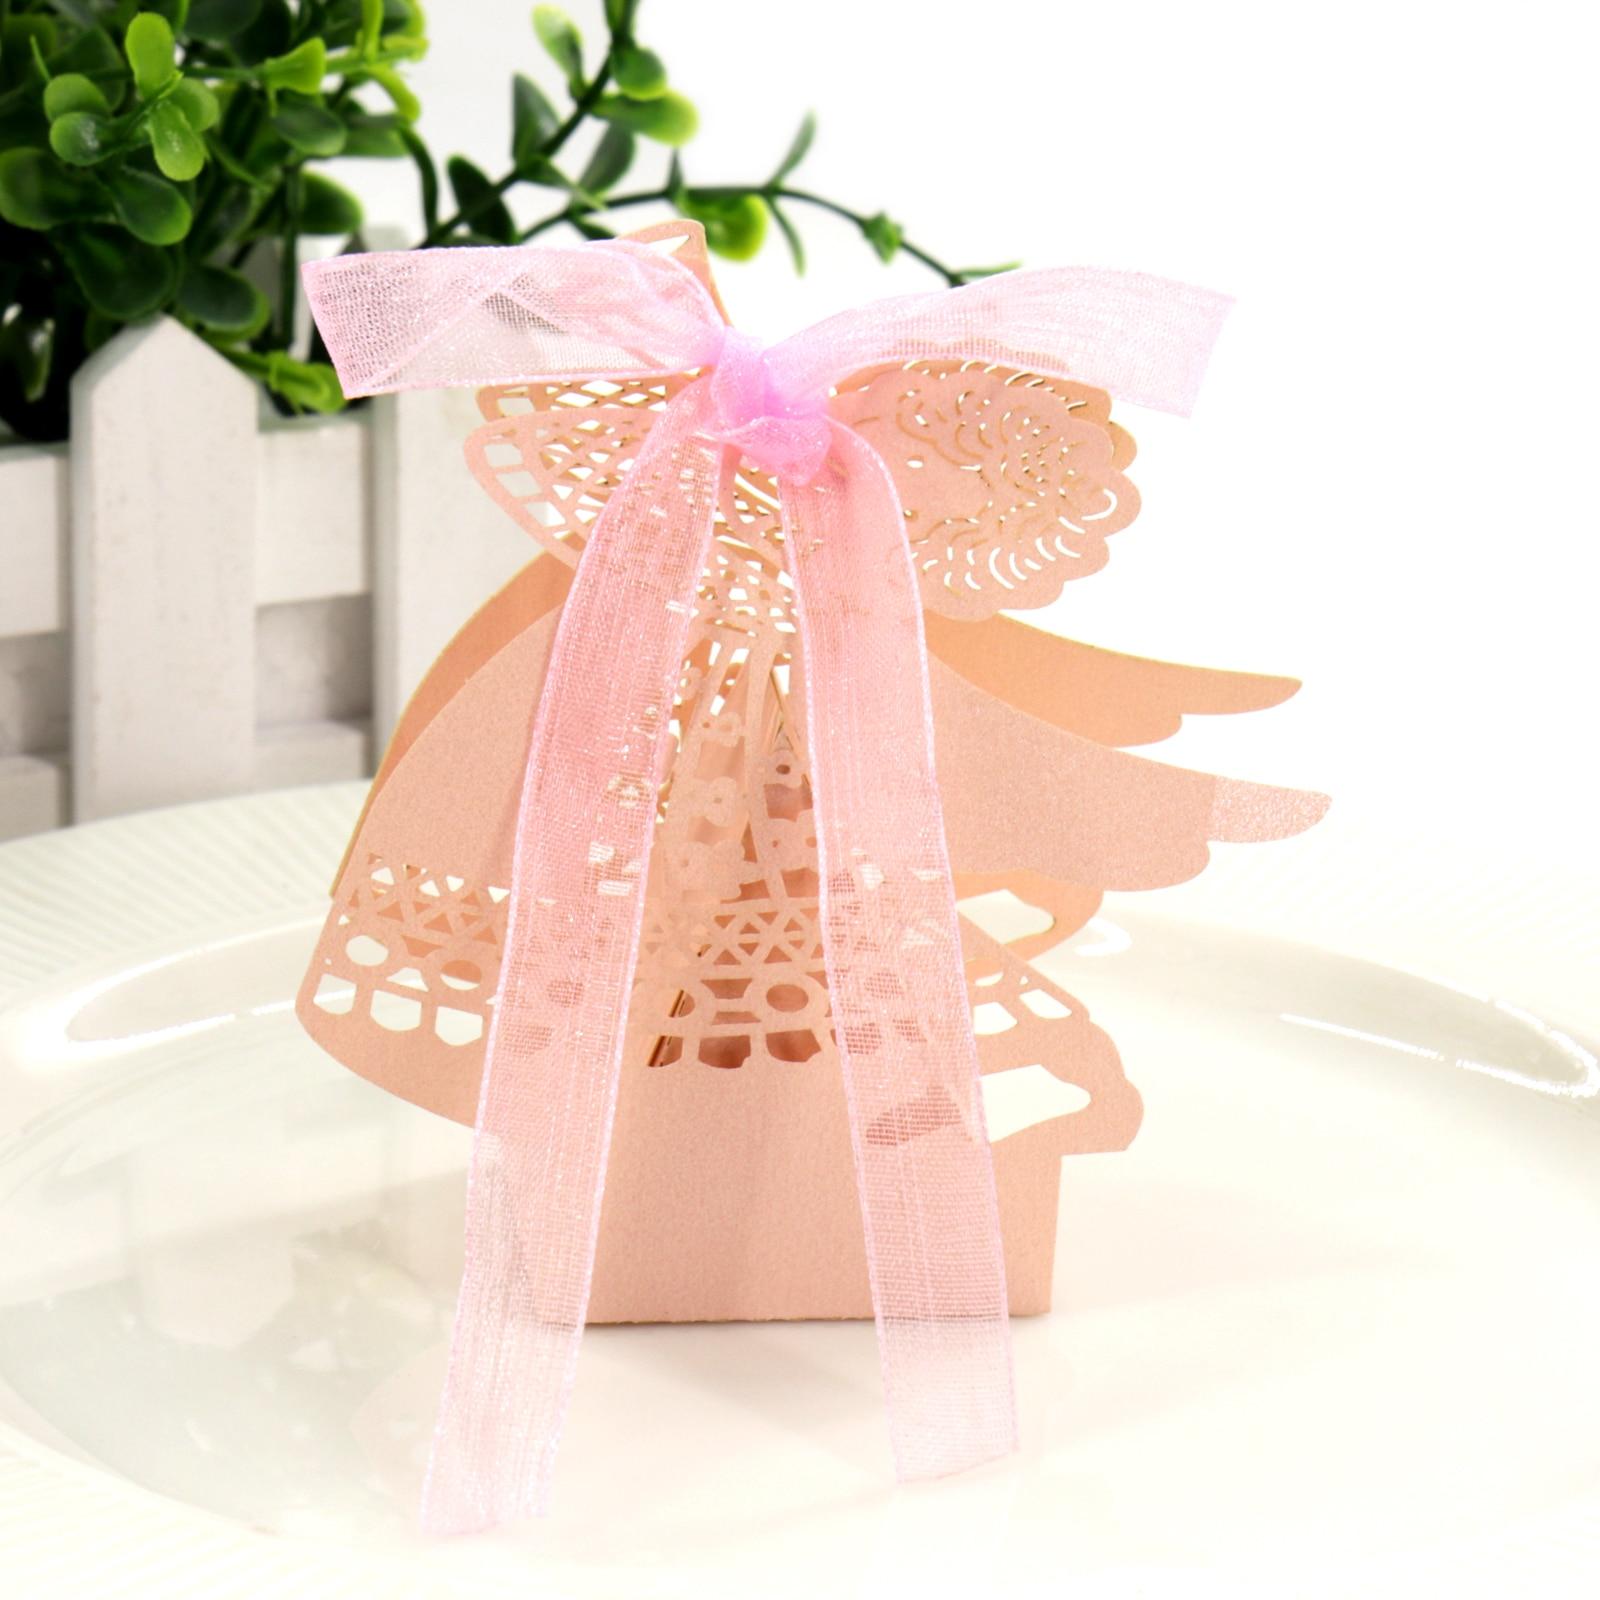 Купить с кэшбэком 10PCS/lot Laser Cut Angel Wedding Candy Box Chocolate Gift For Guest Wedding Favors Packaging Gift  Birthday Party Decoration